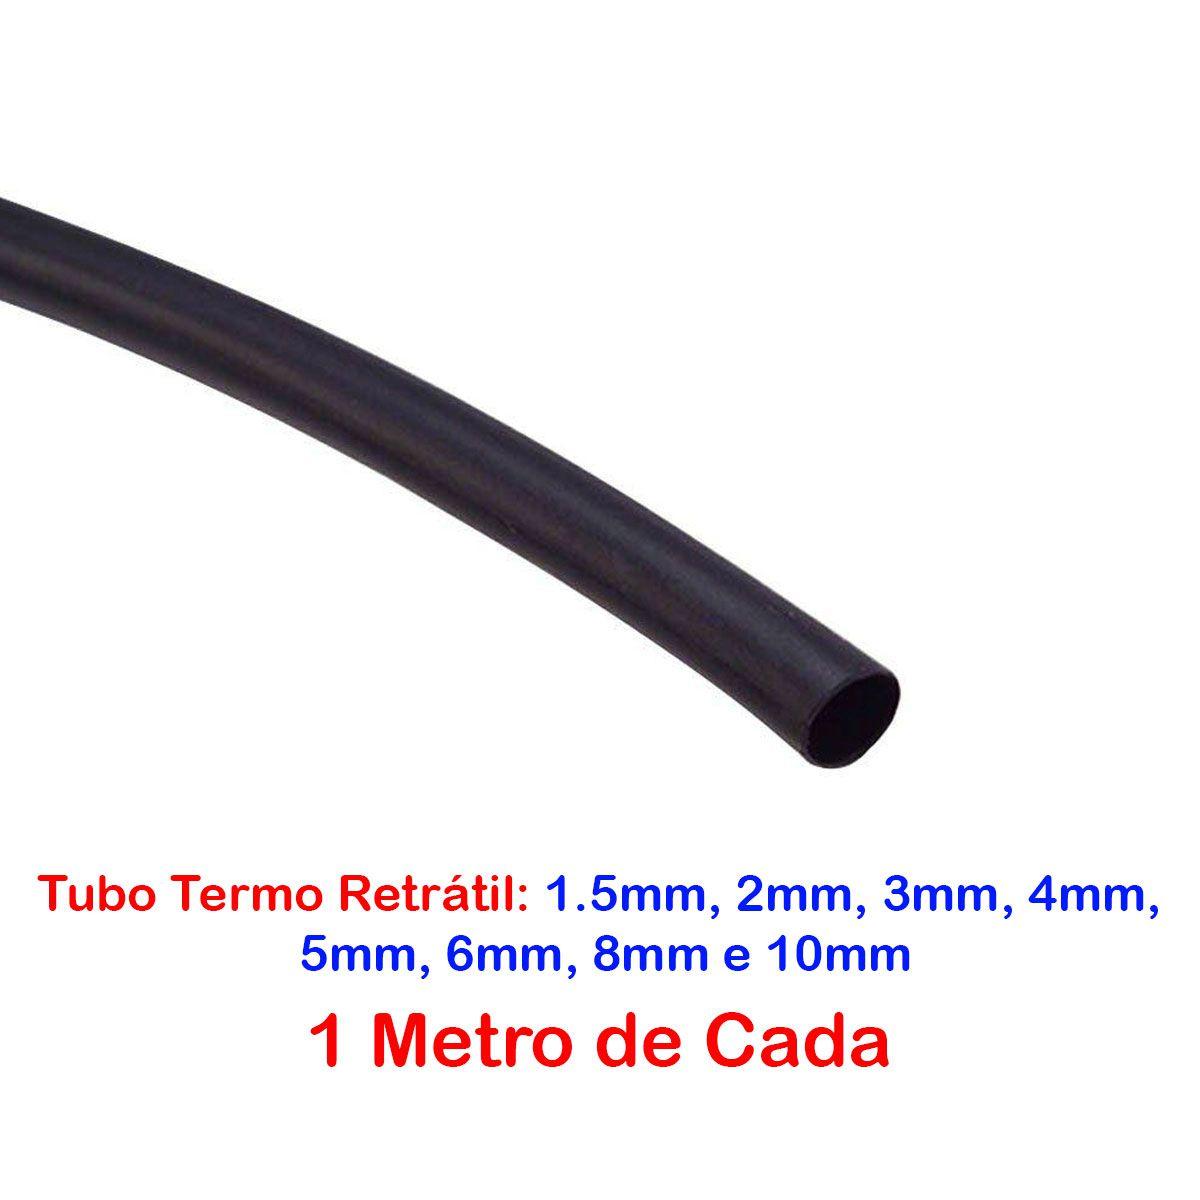 Kit: Espaguete isolante / Tubo termo retrátil 1 metro de cada: 1.5mm, 2mm, 3mm, 4mm, 5mm, 6mm, 8mm e 10mm